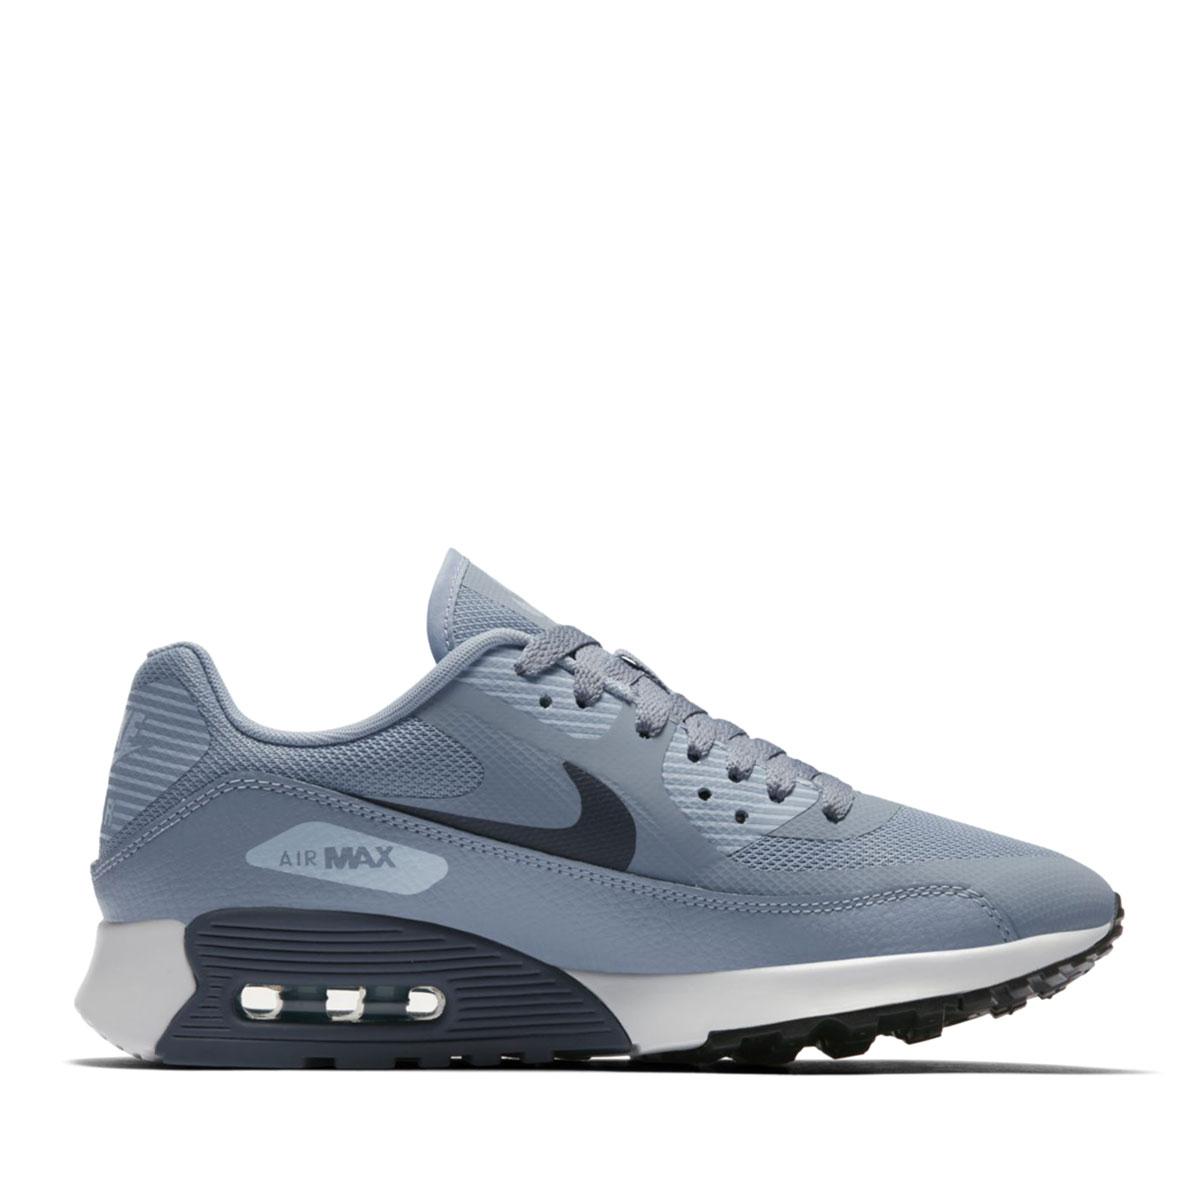 fe10c78ee62c NIKE W AIR MAX 90 ULTRA 2.0 (Nike women Air Max 90 ultra 2.0) (MICA BLUE  BLUE FOX-GLACIER BLUE)